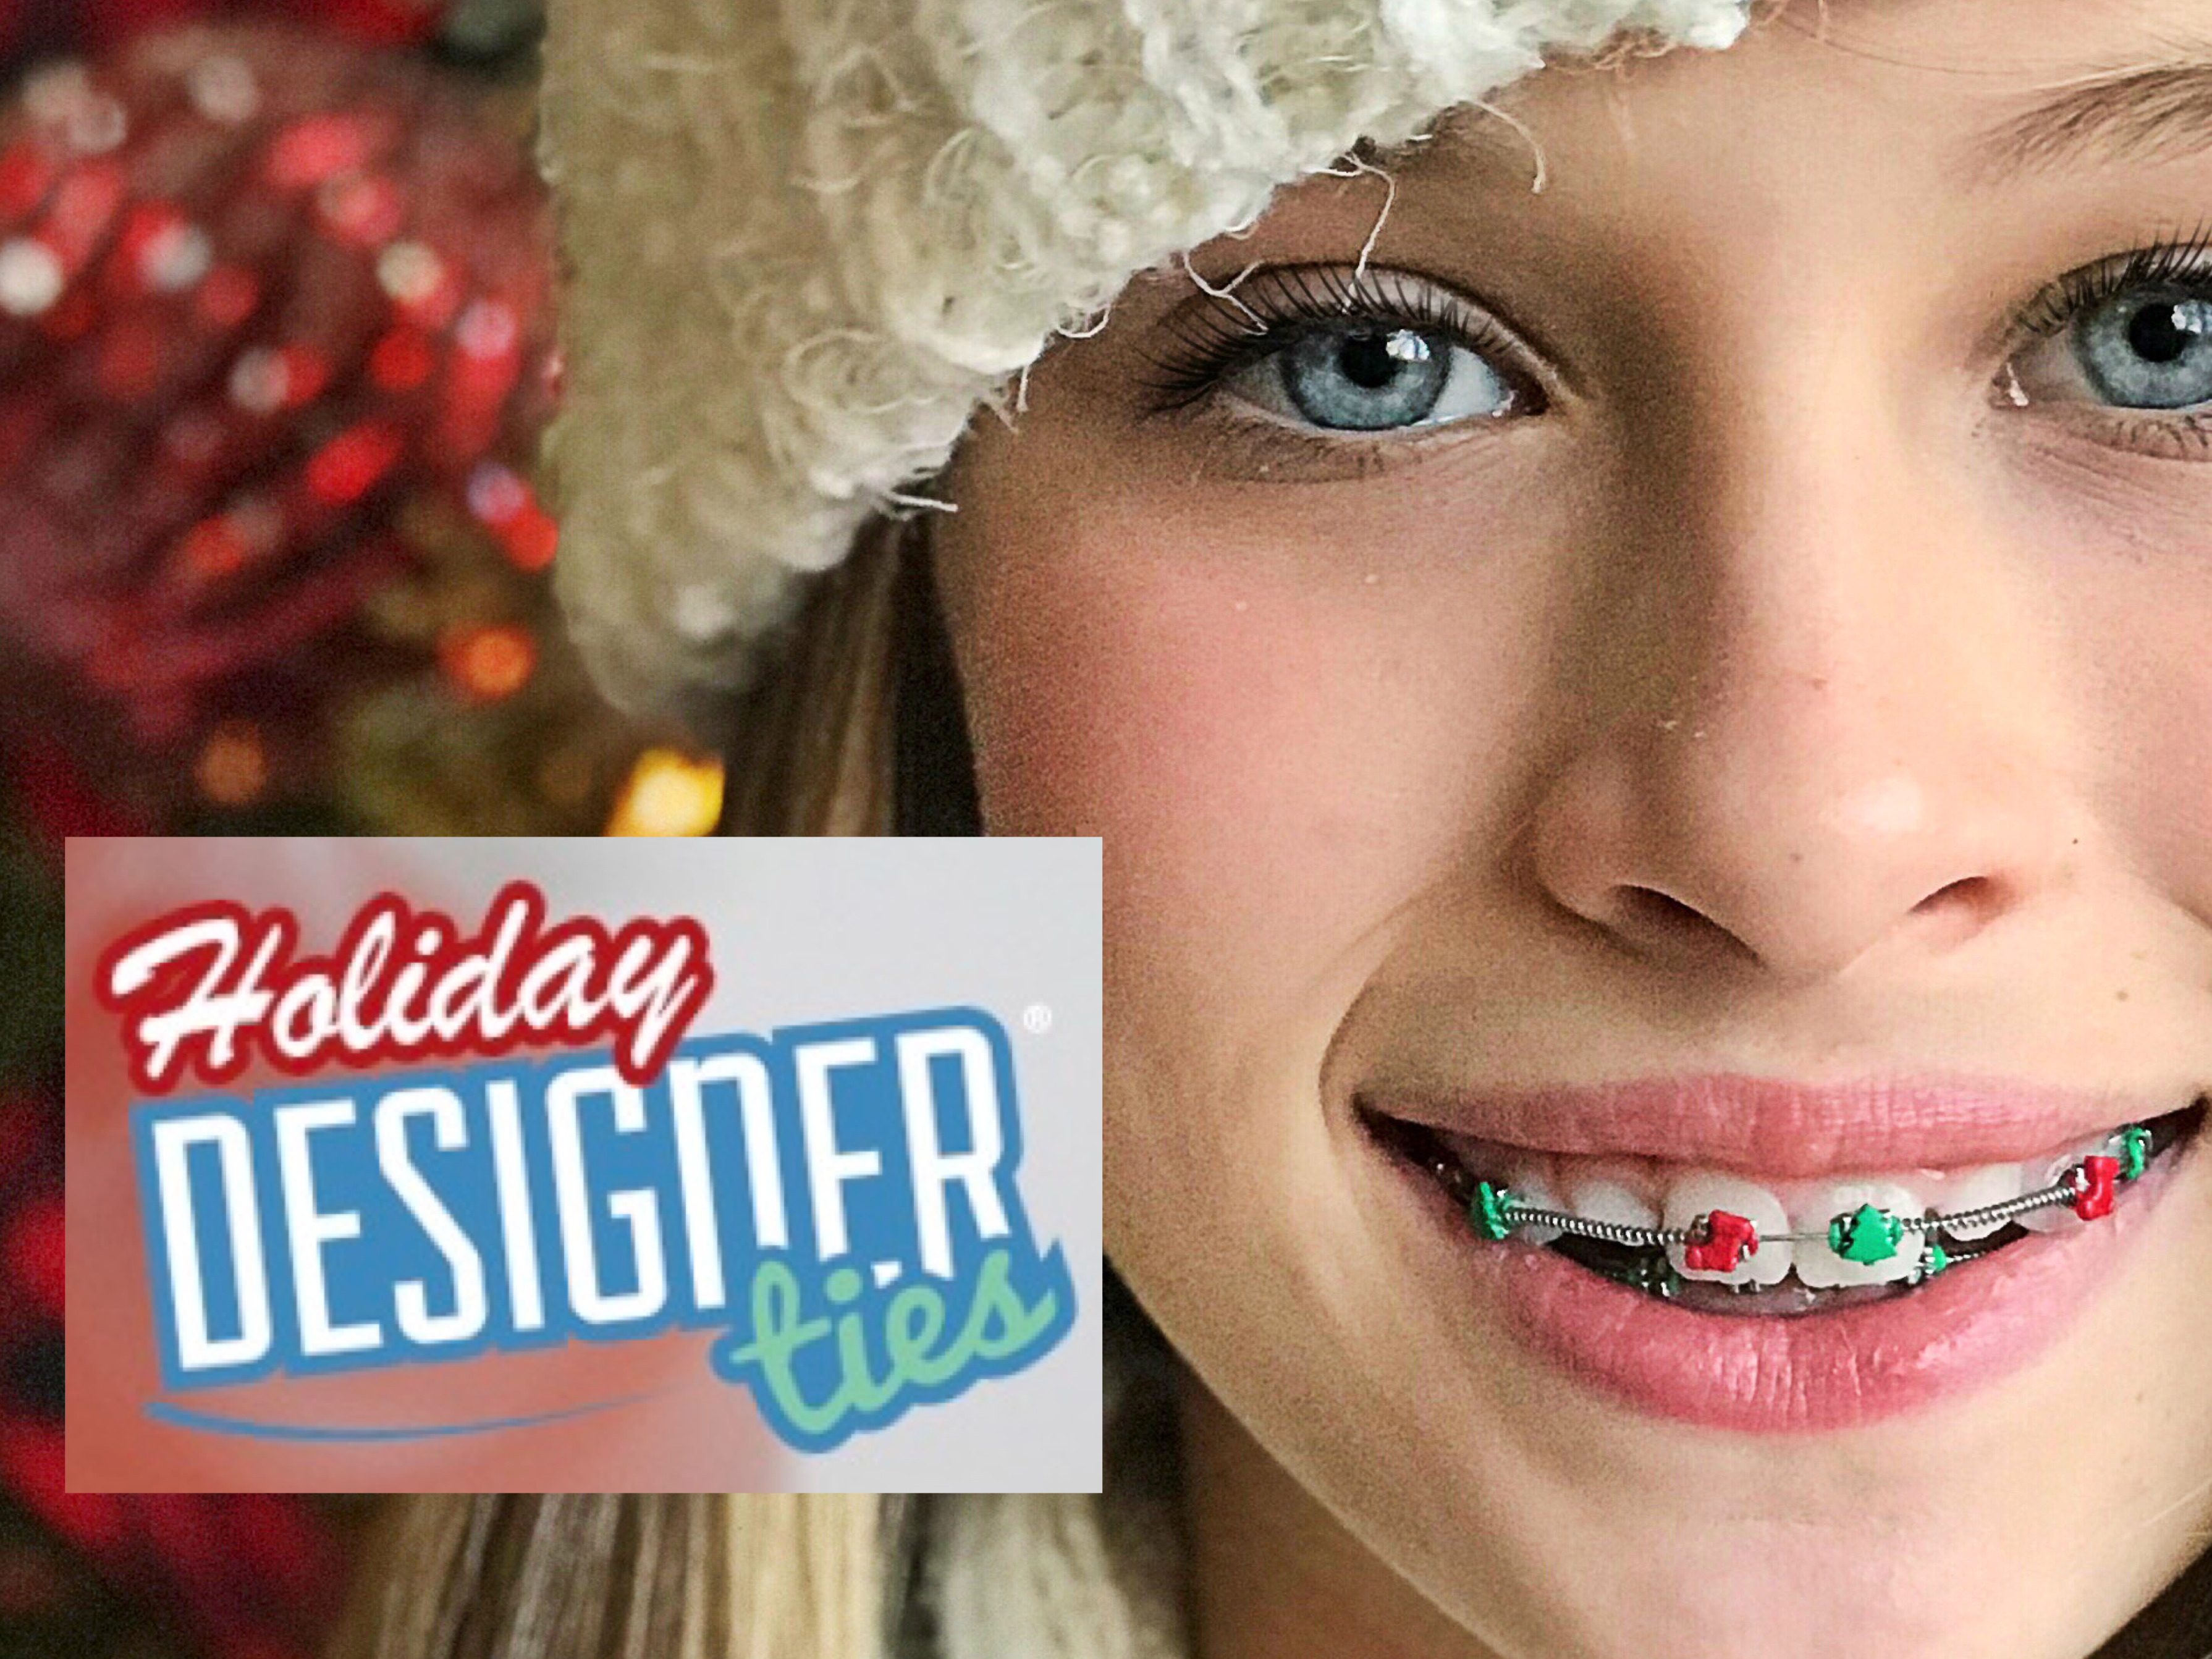 Designerties For Braces Orthodontics Ligature Ties Orthodontic Marketing Fun Braces